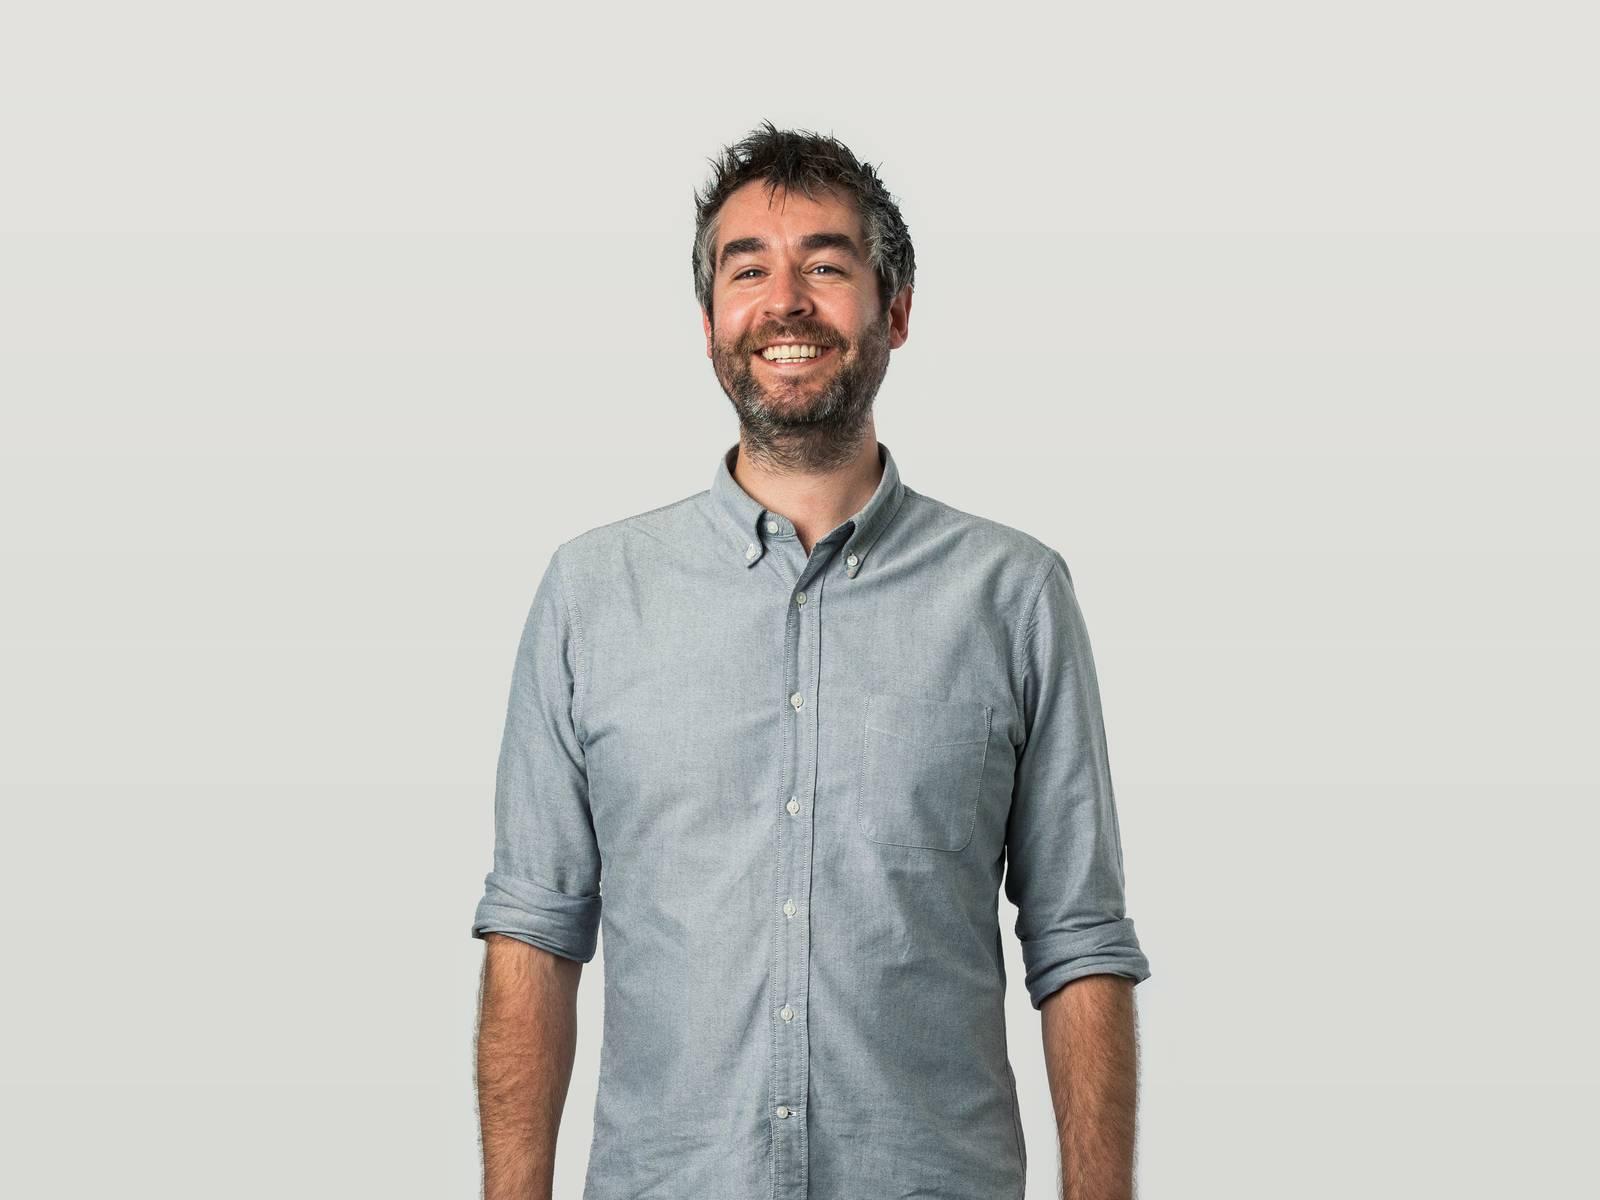 A profile image of Matt Bilson